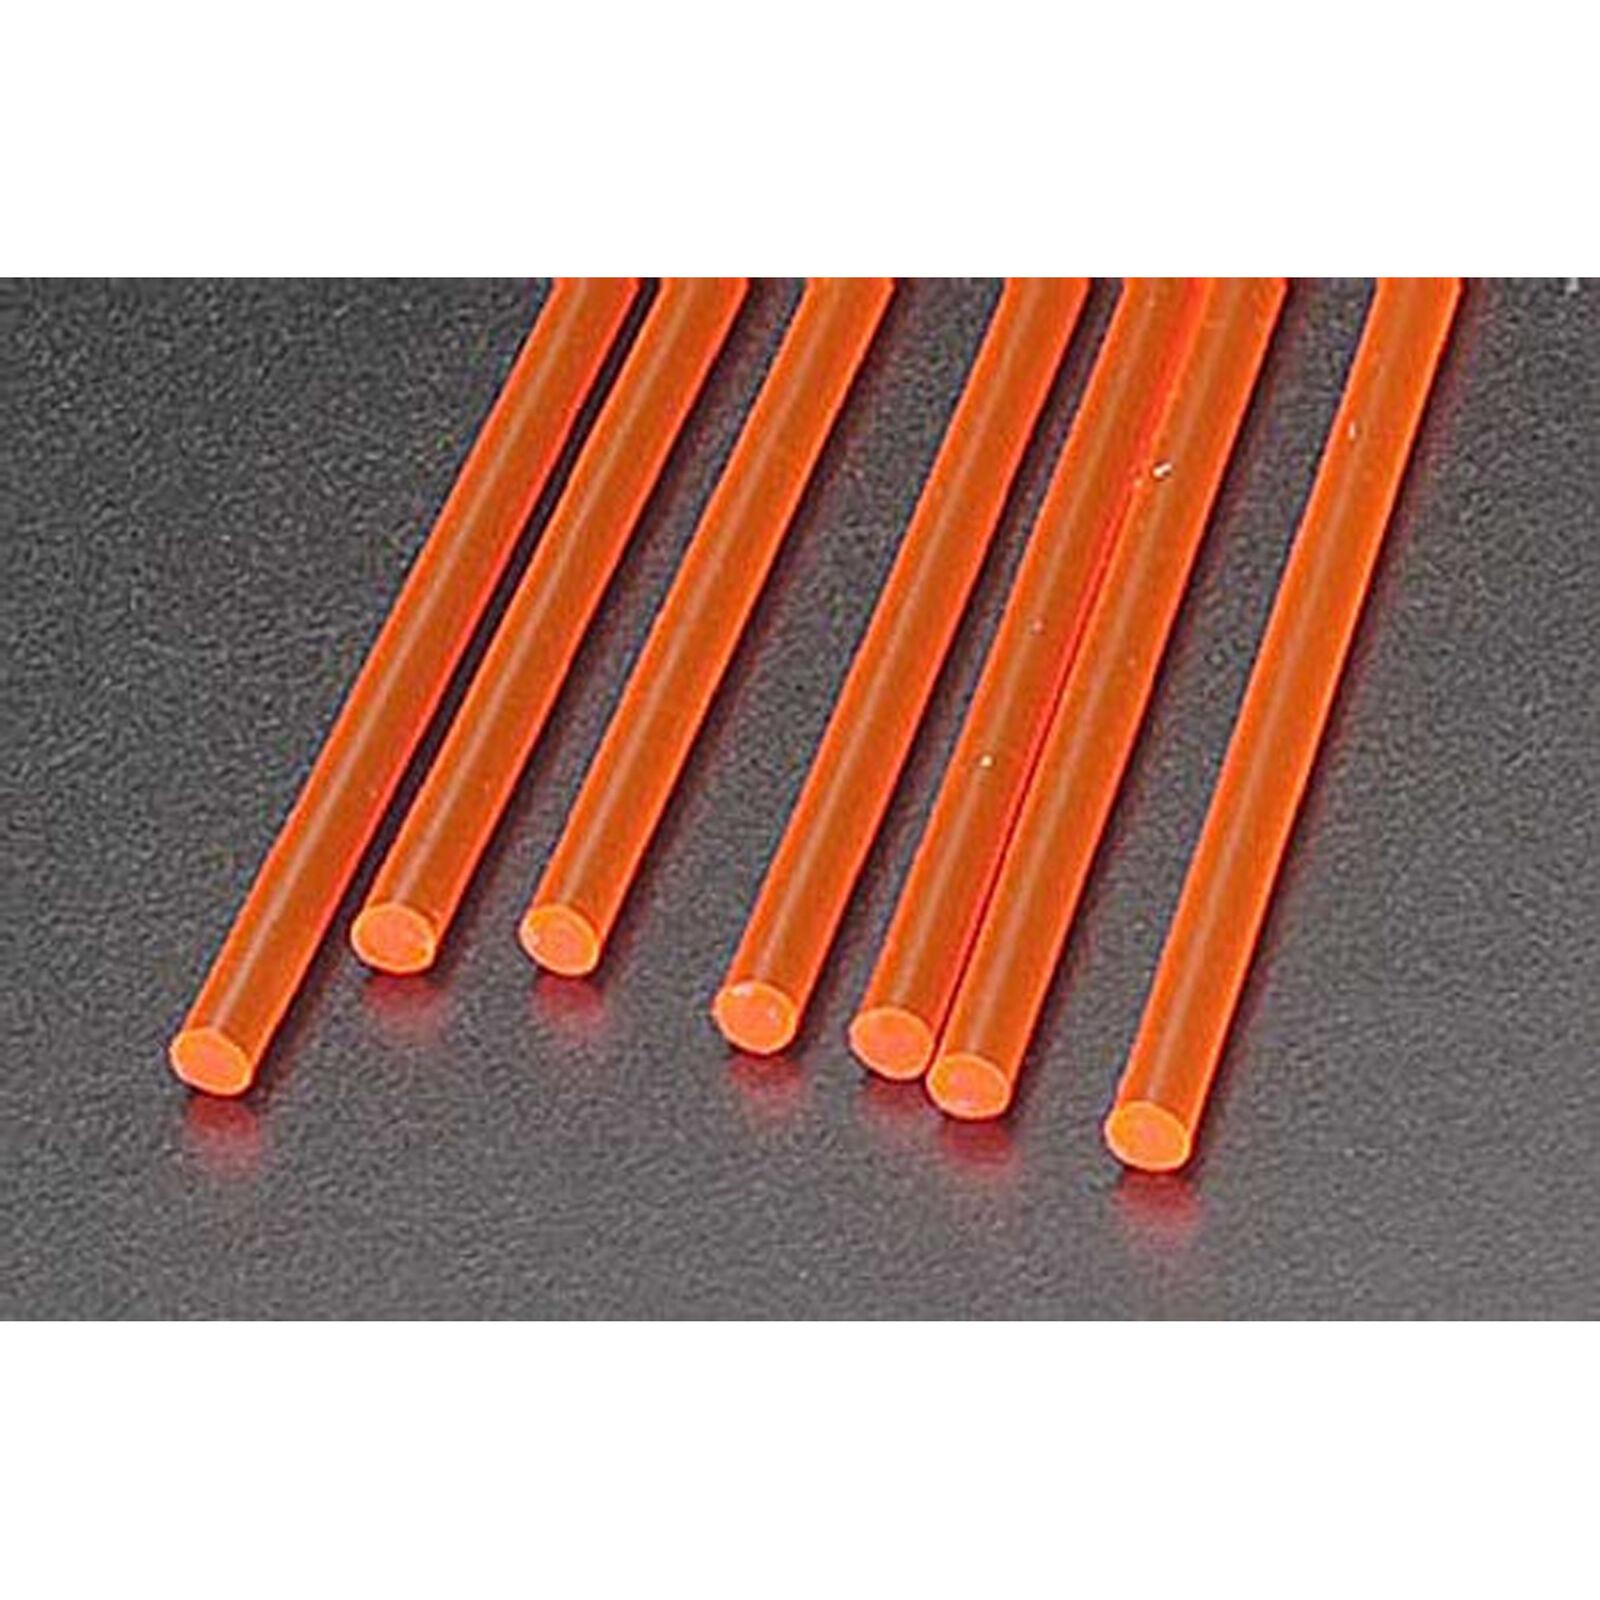 "FARR-4H Fluor Red Rod,1/8"" (7)"